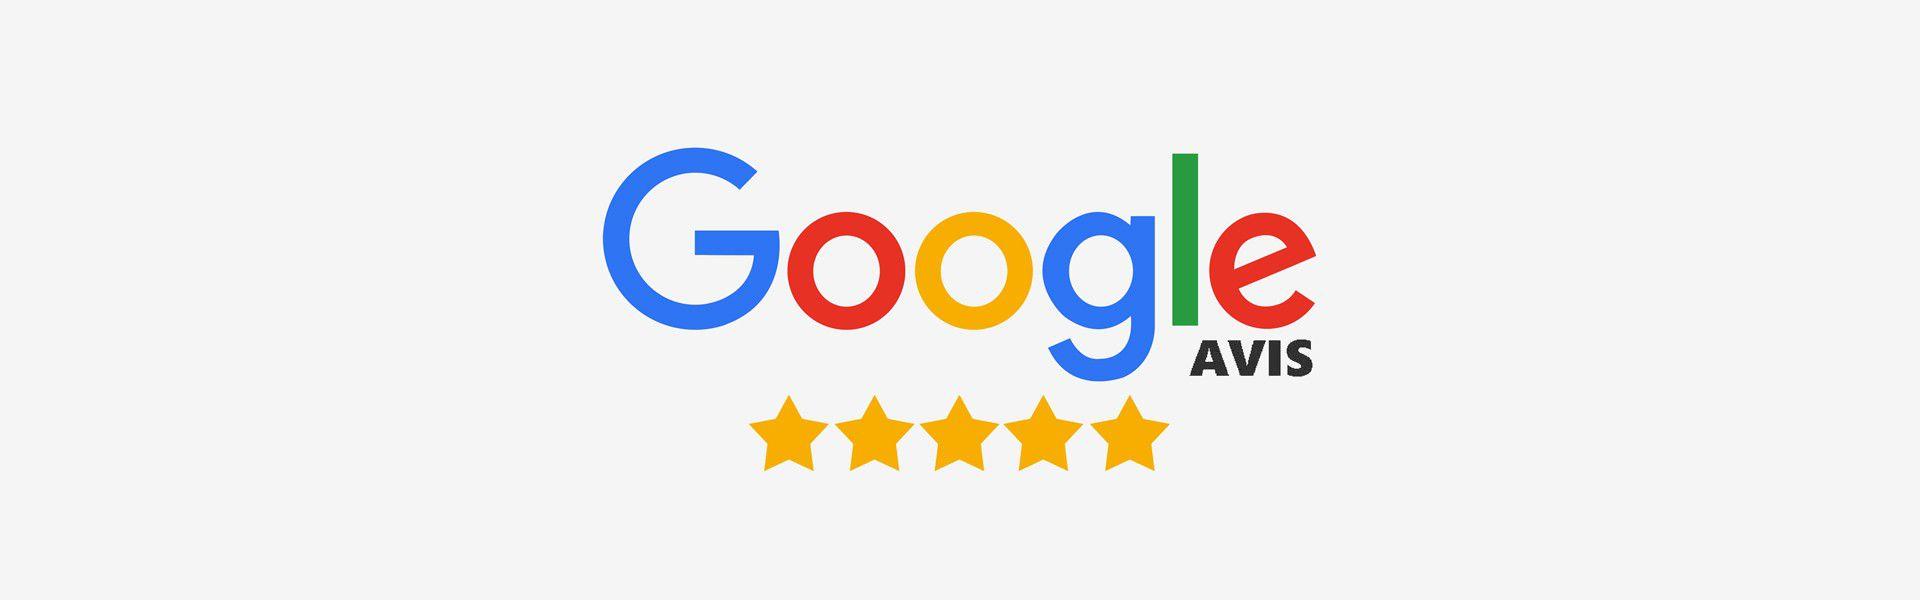 Google Avis | Villechalane-Sionneau